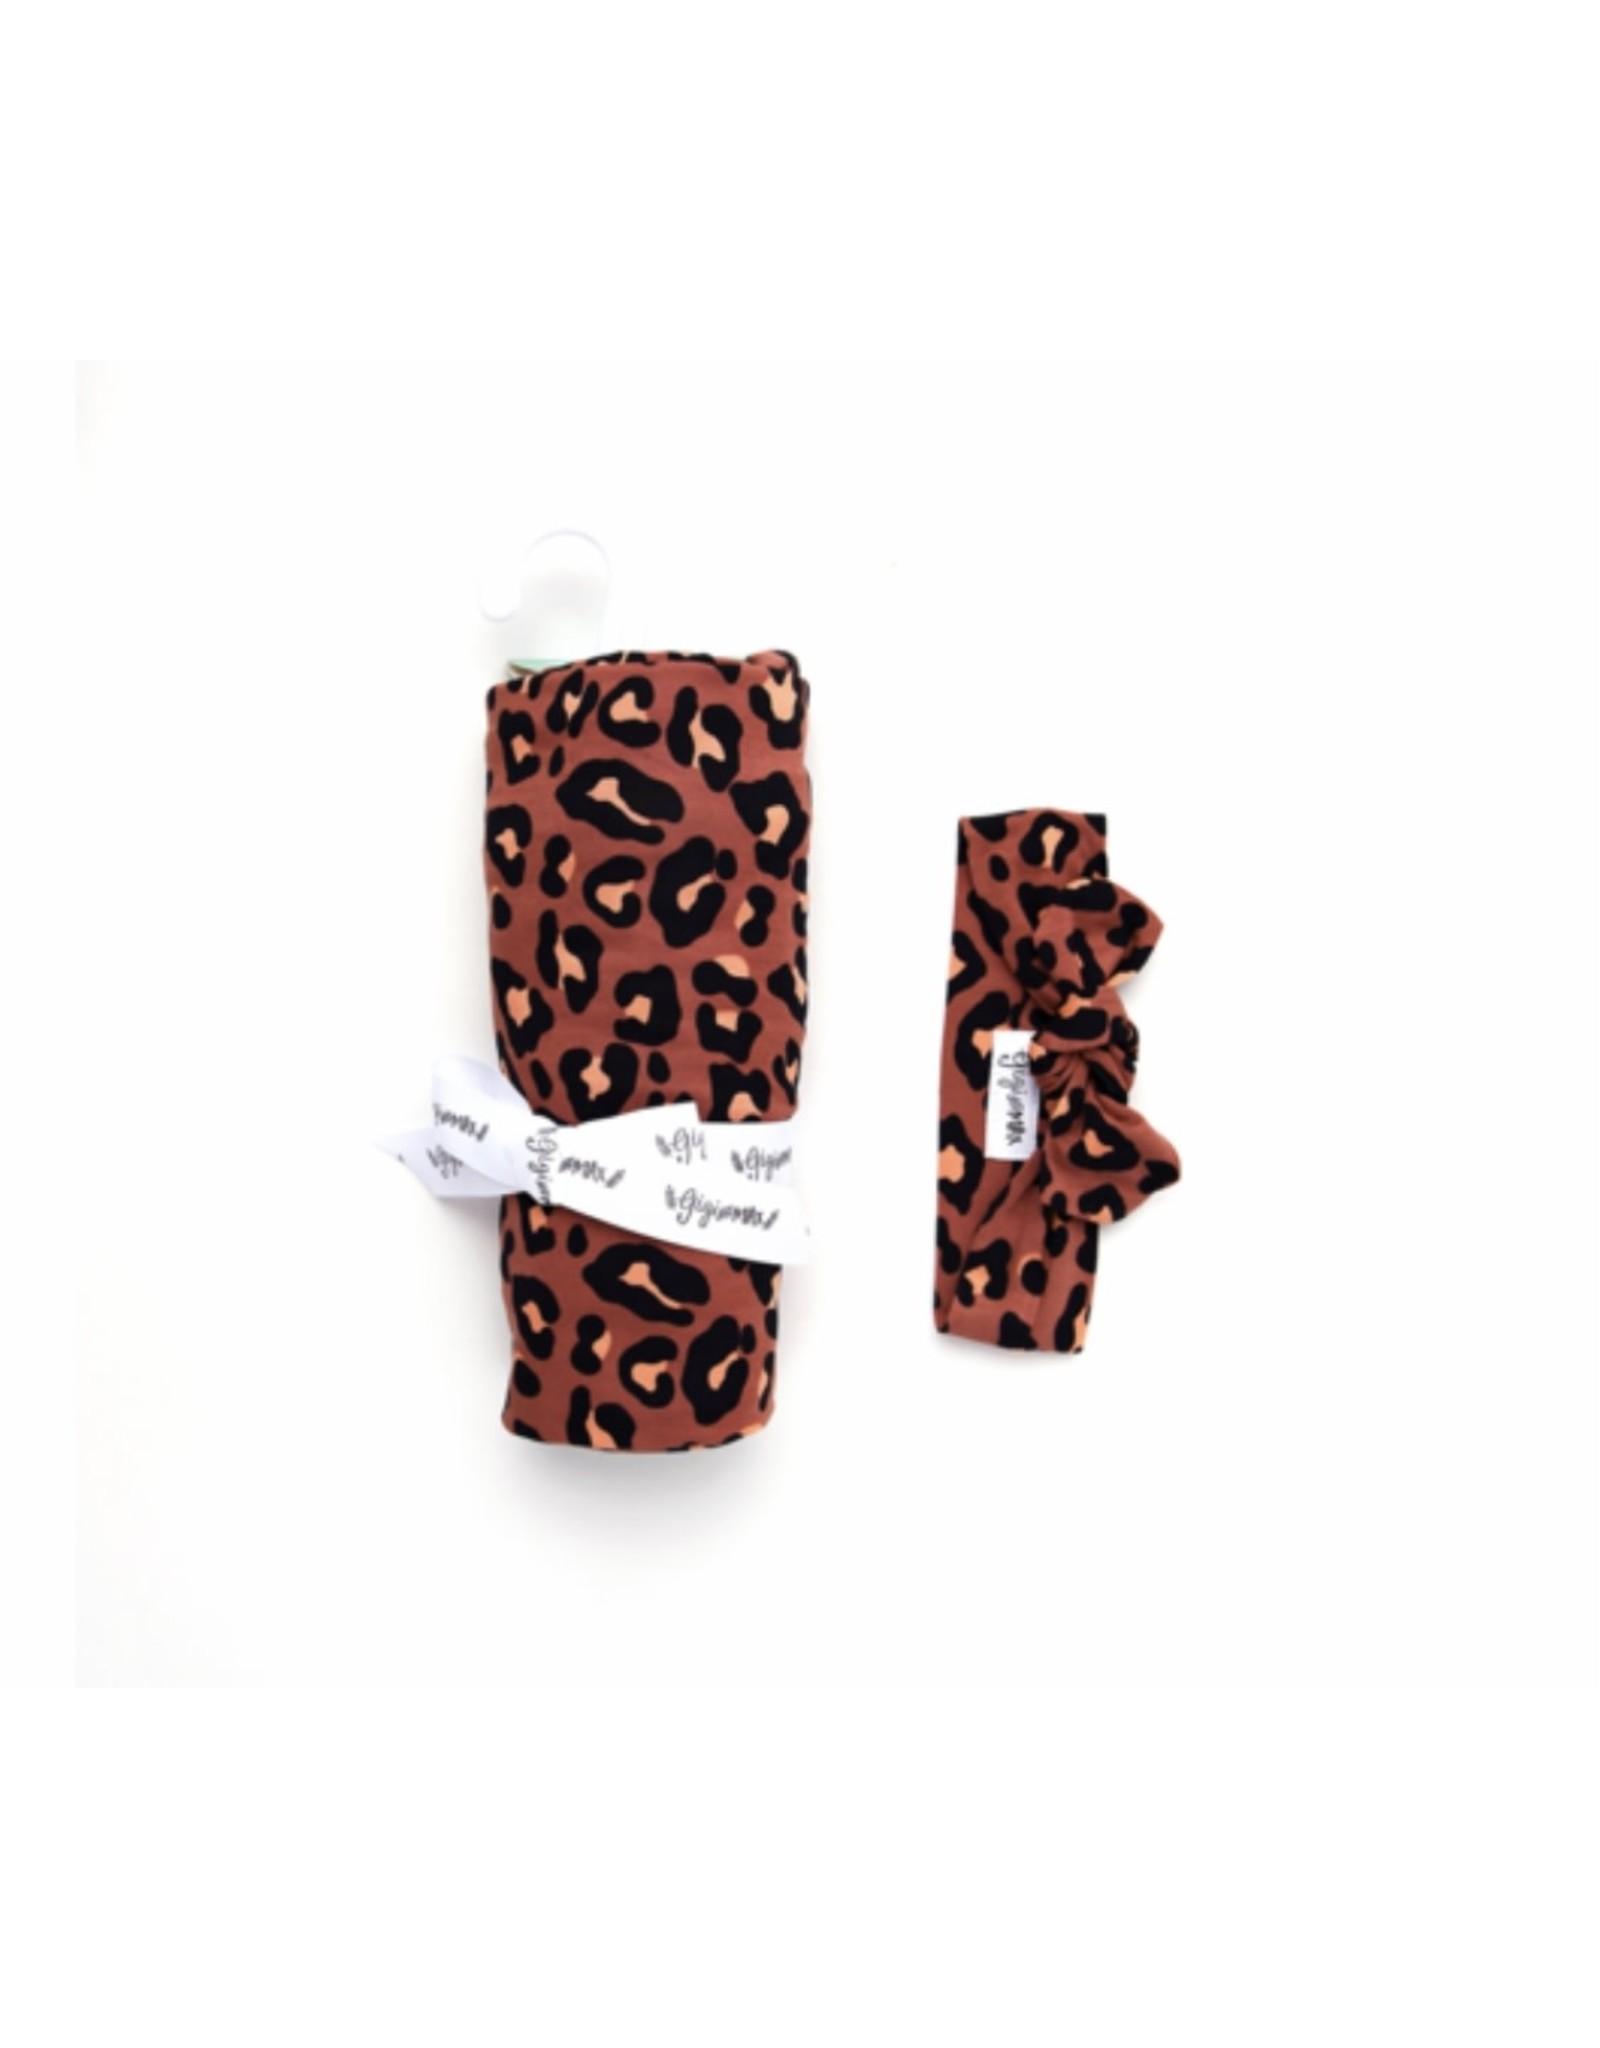 Gigi & Max Gigi & Max- Sienna Leopard Blanket & Headband Set